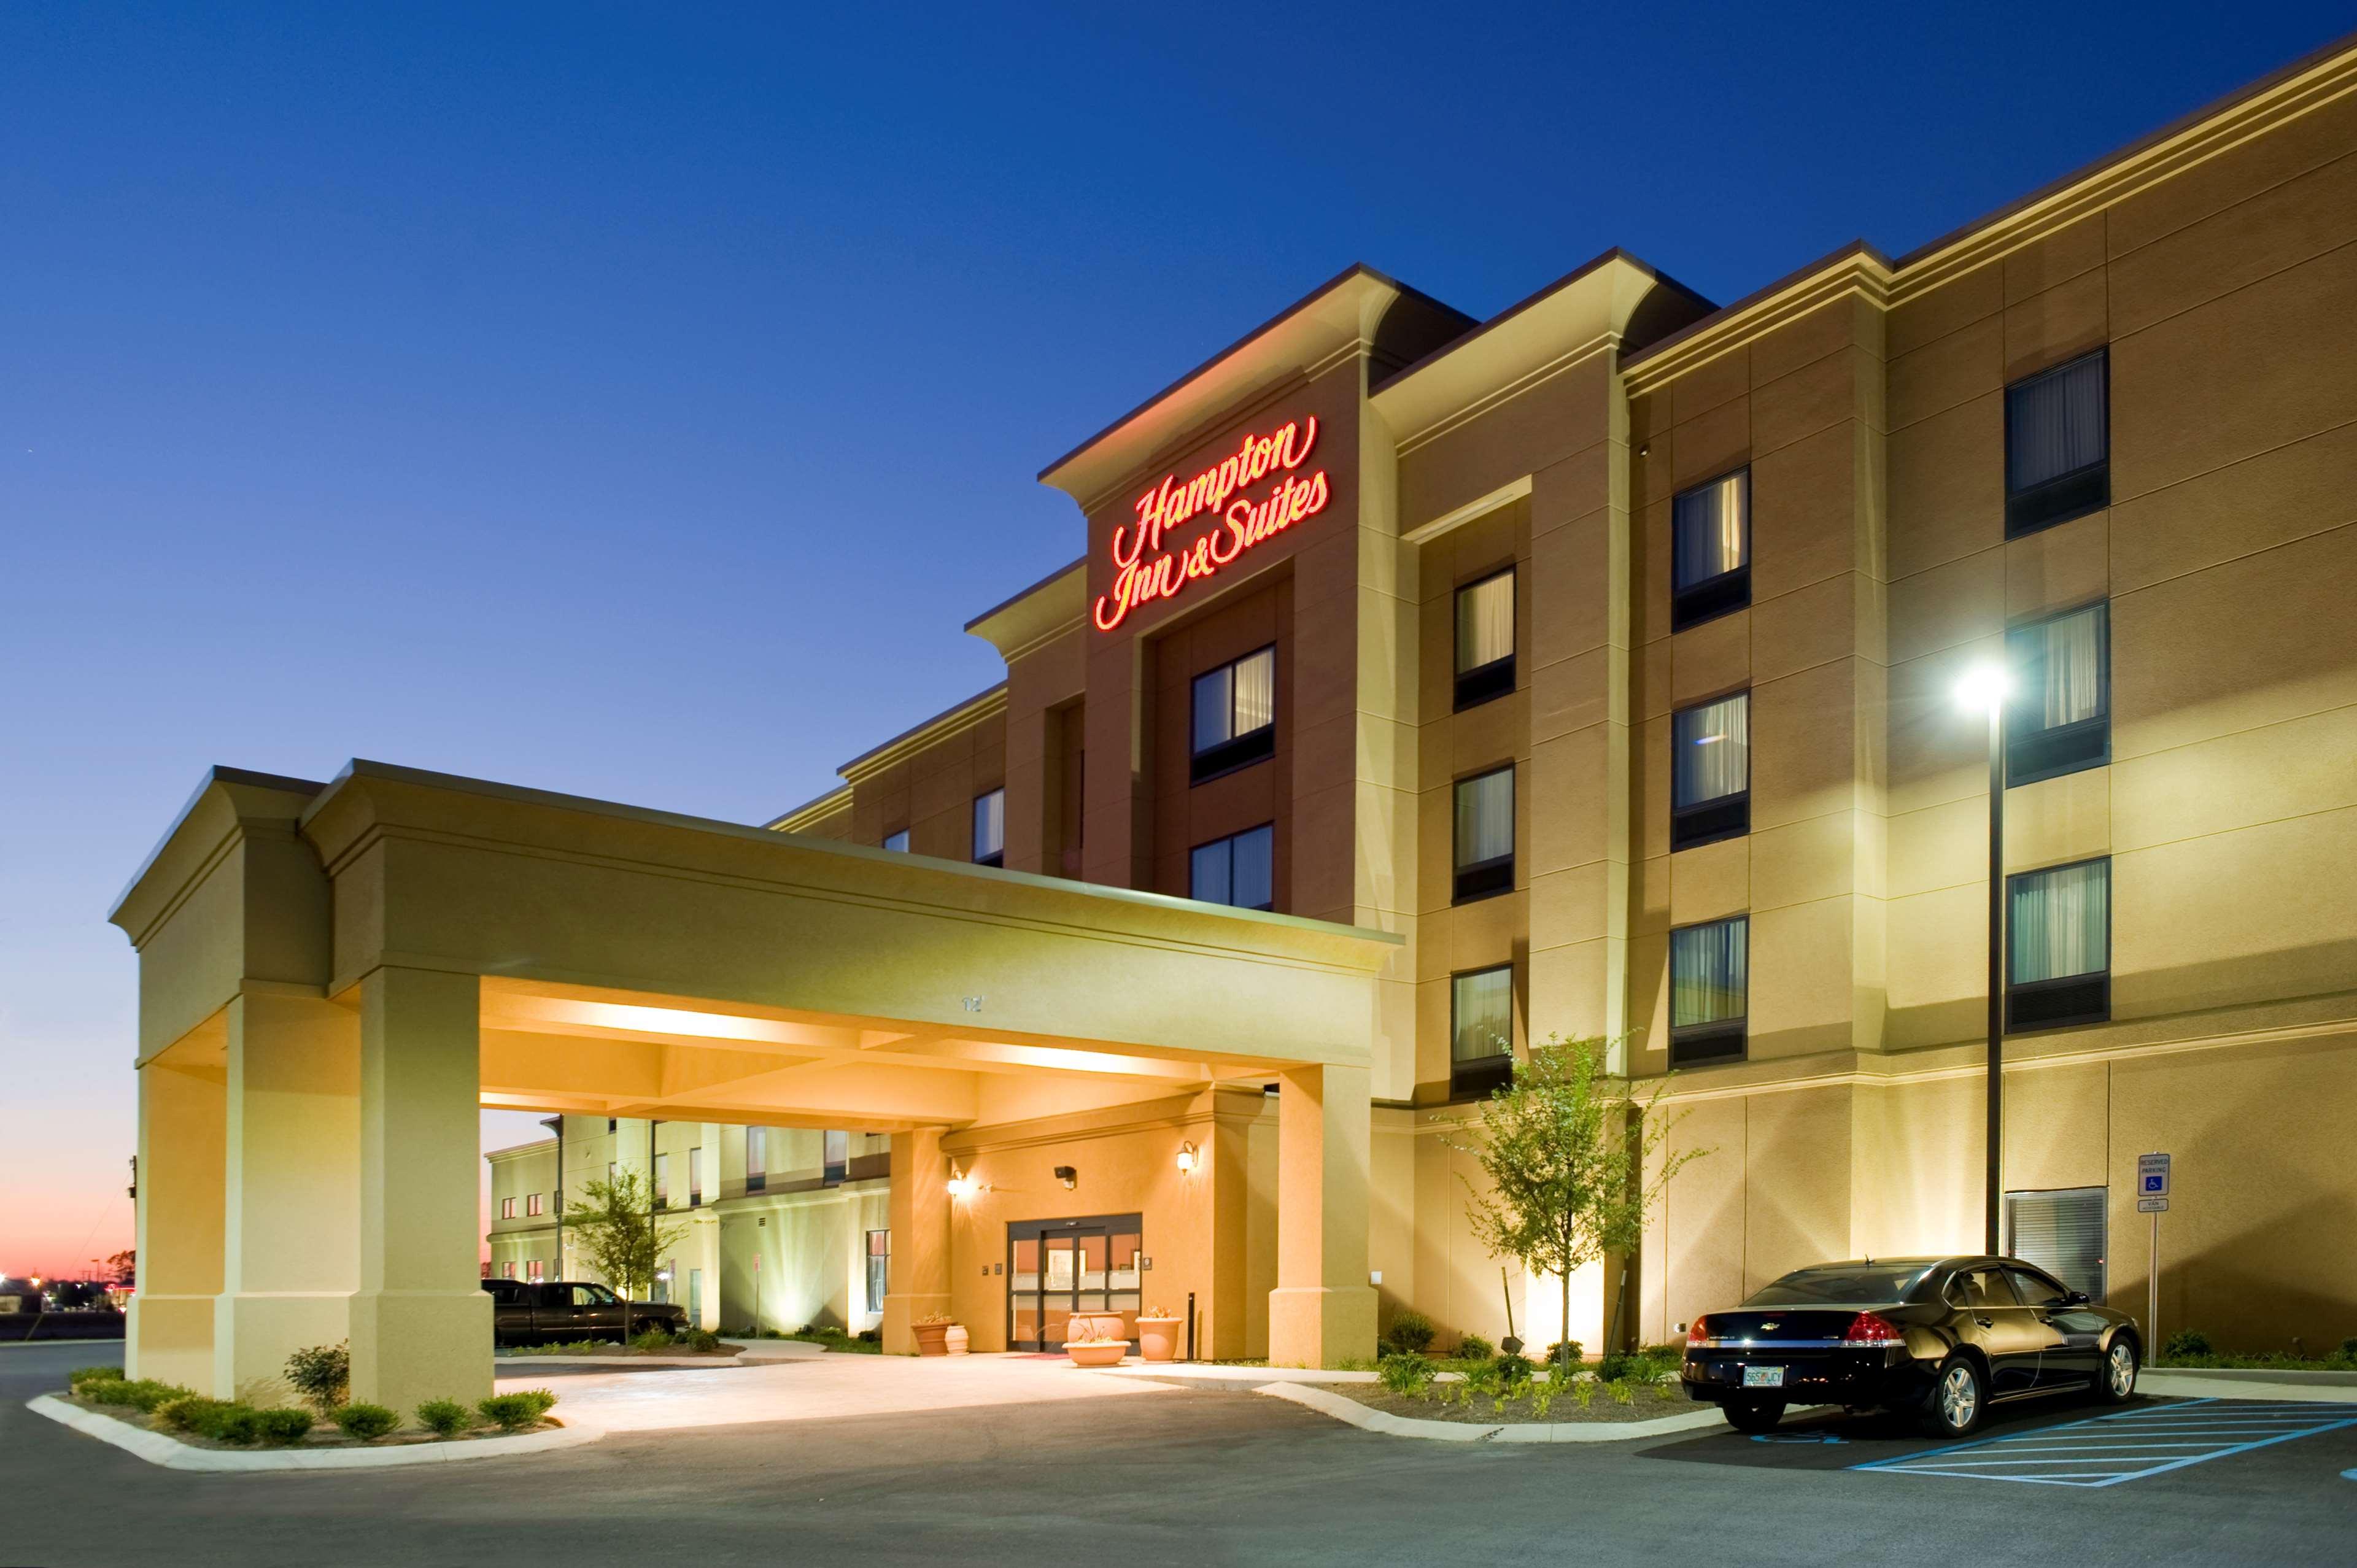 Hampton Inn Amp Suites Tupelo Barnes Crossing 1116 Carter Cv